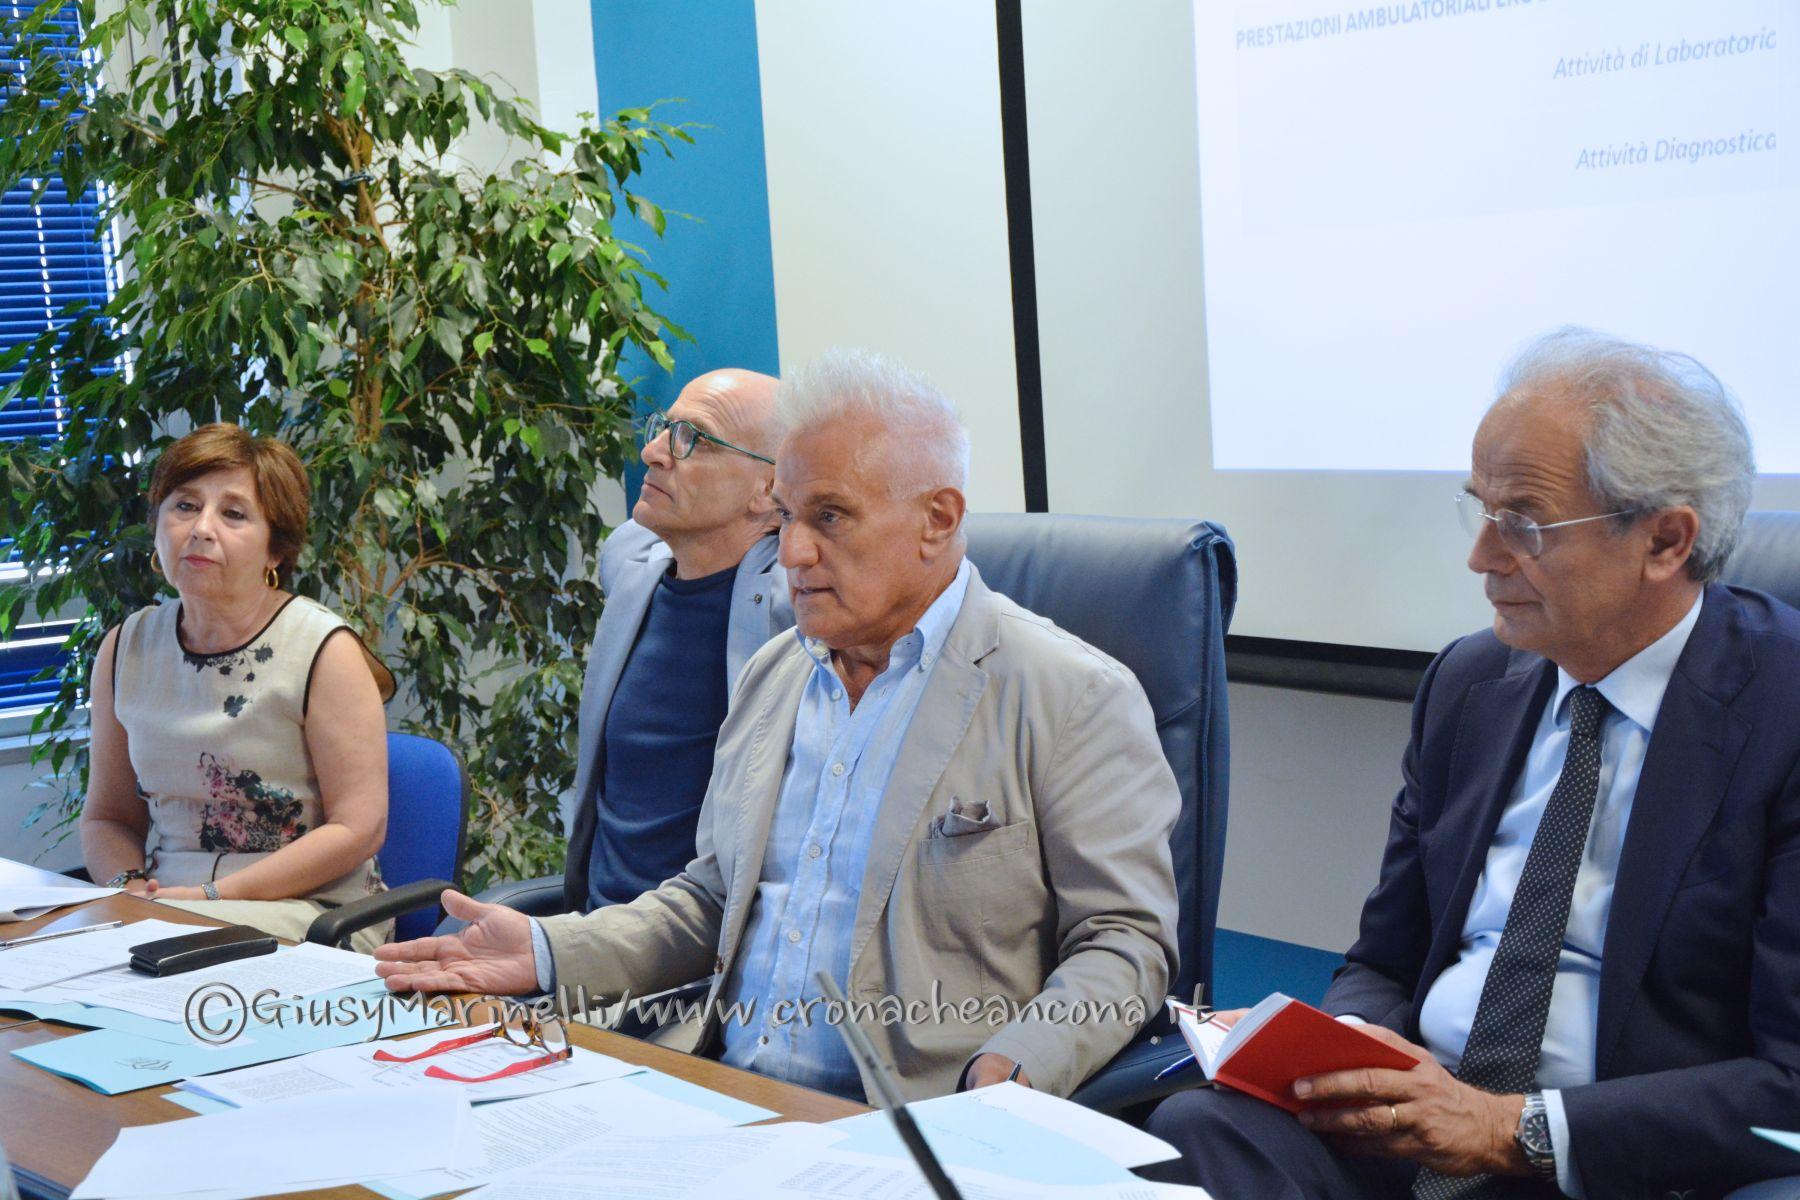 Ospedale_Torrette-dati-primari-DSC_0126-Cerutti-Volpini-Caporossi-Longhi